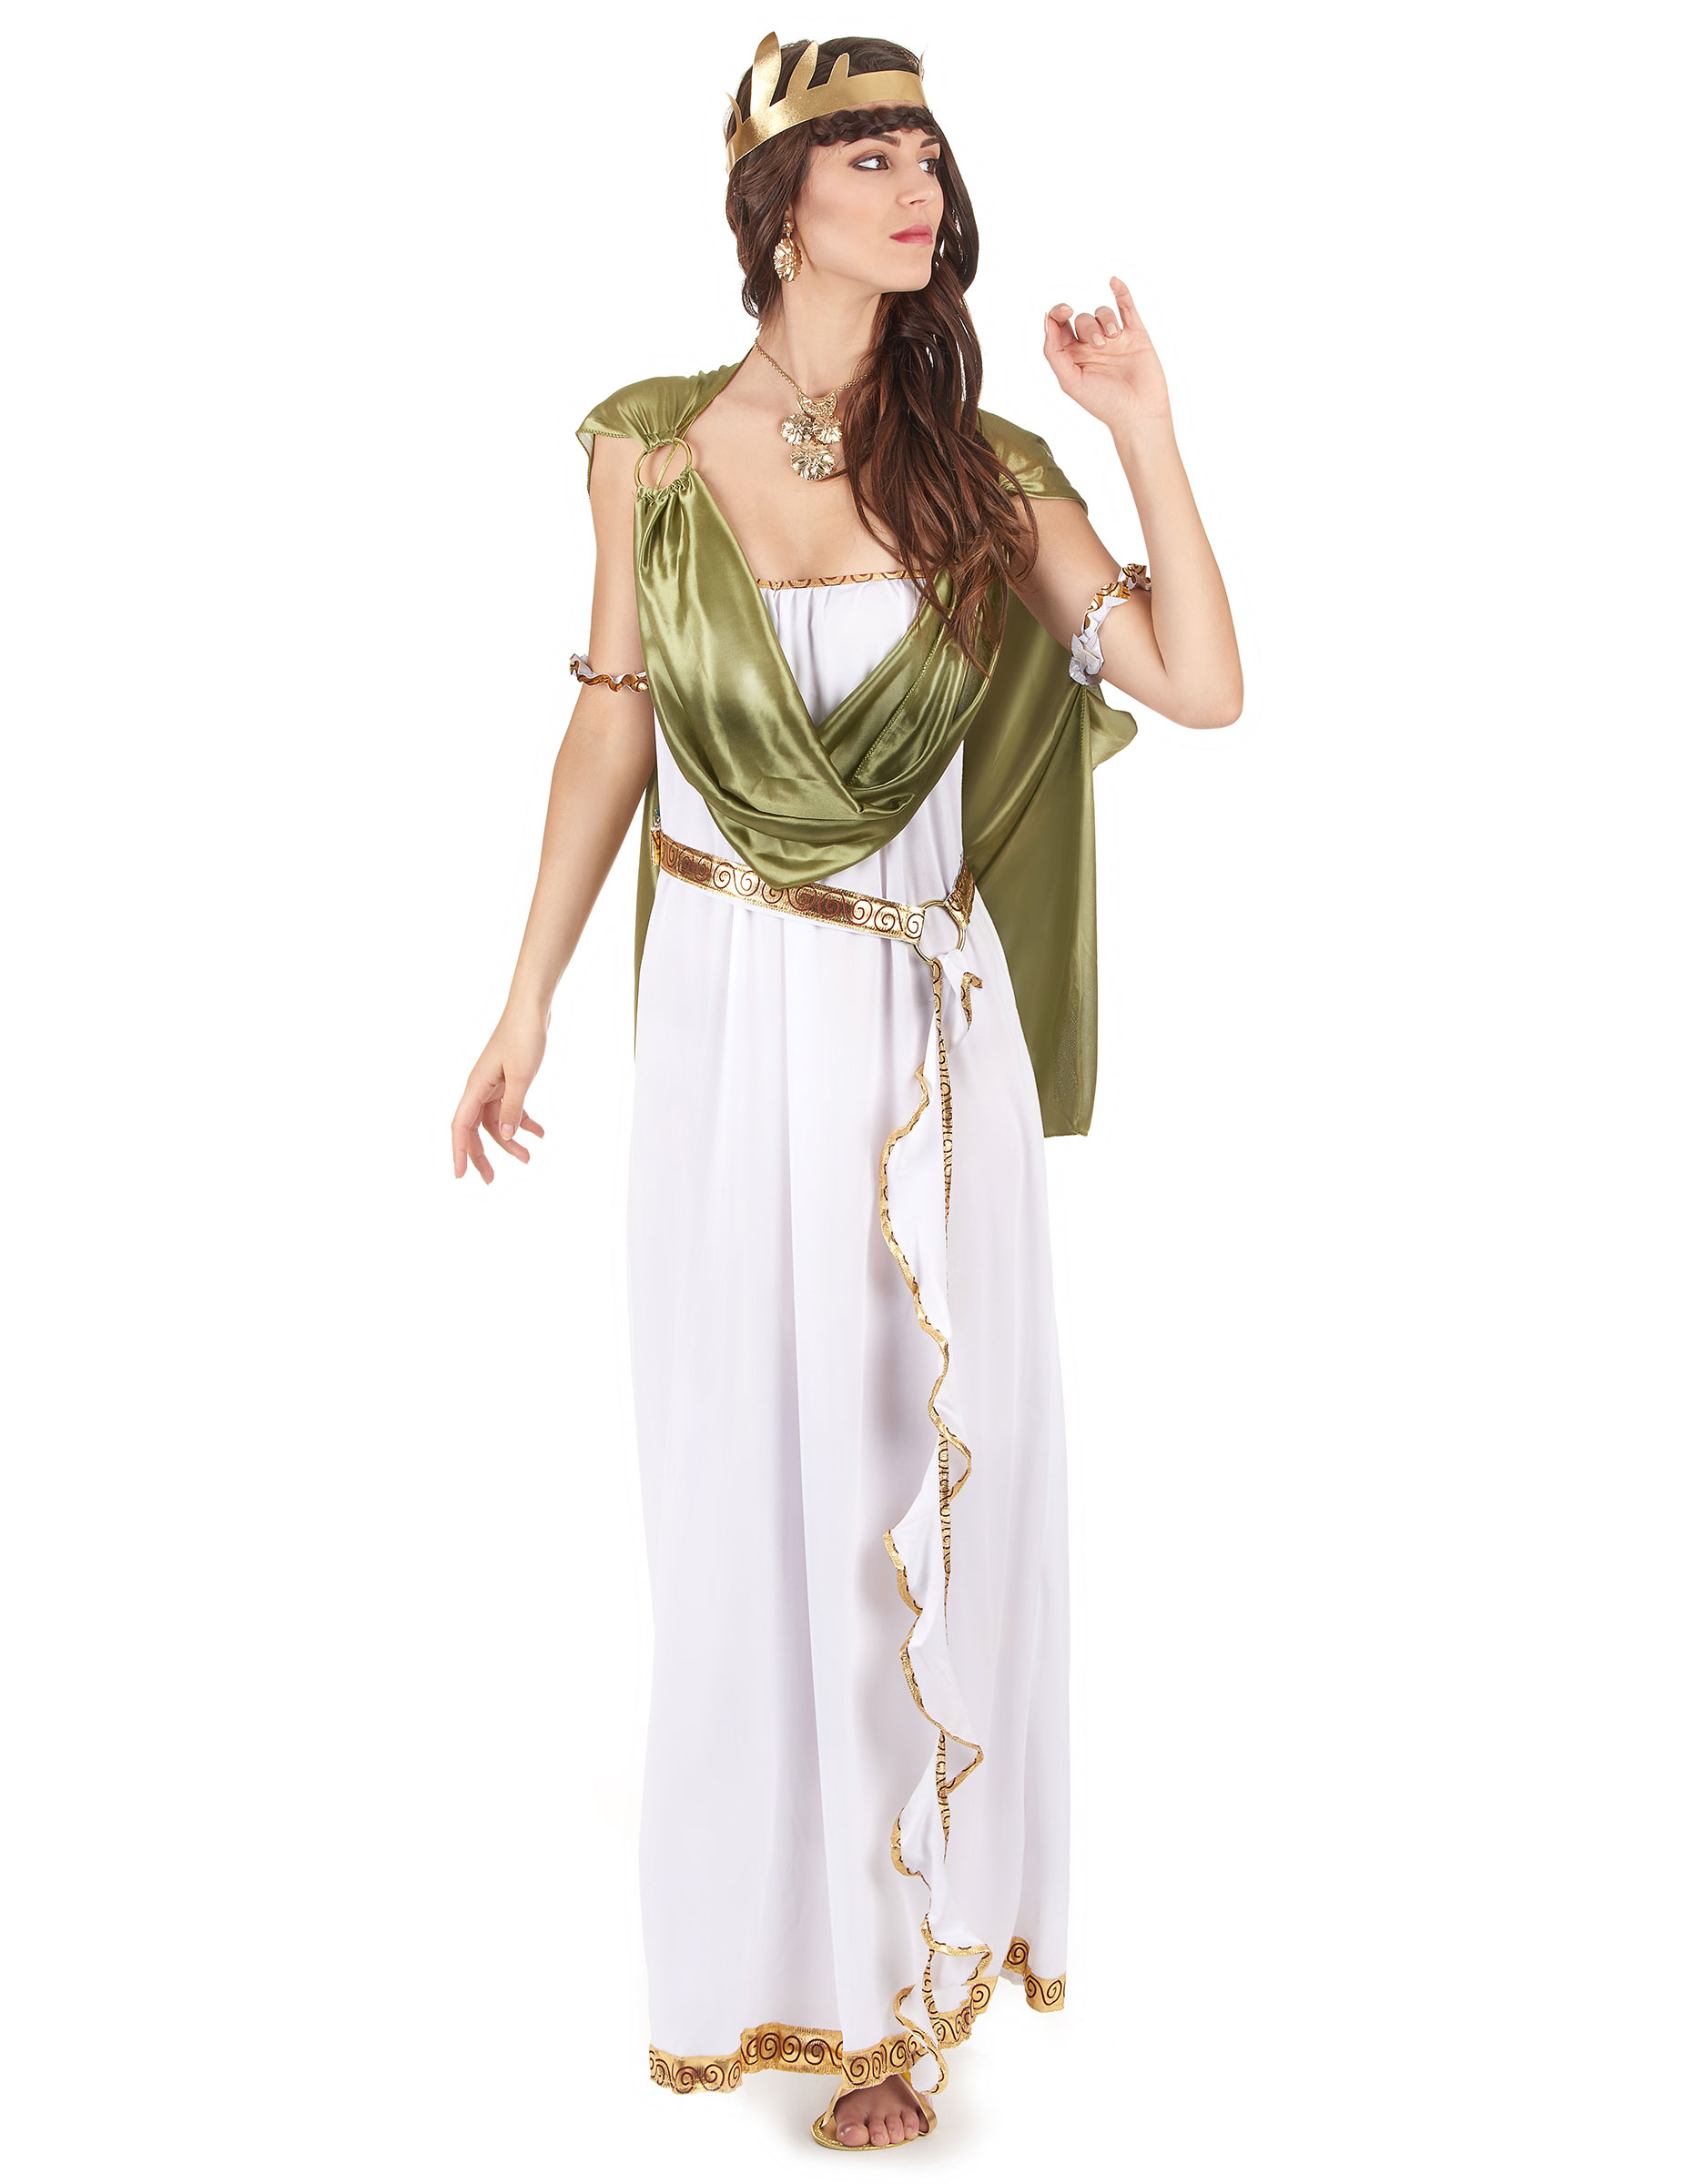 fcc739a007a666 Griekse godinnen verkleedkleding voor vrouwen - Vegaoo.nl